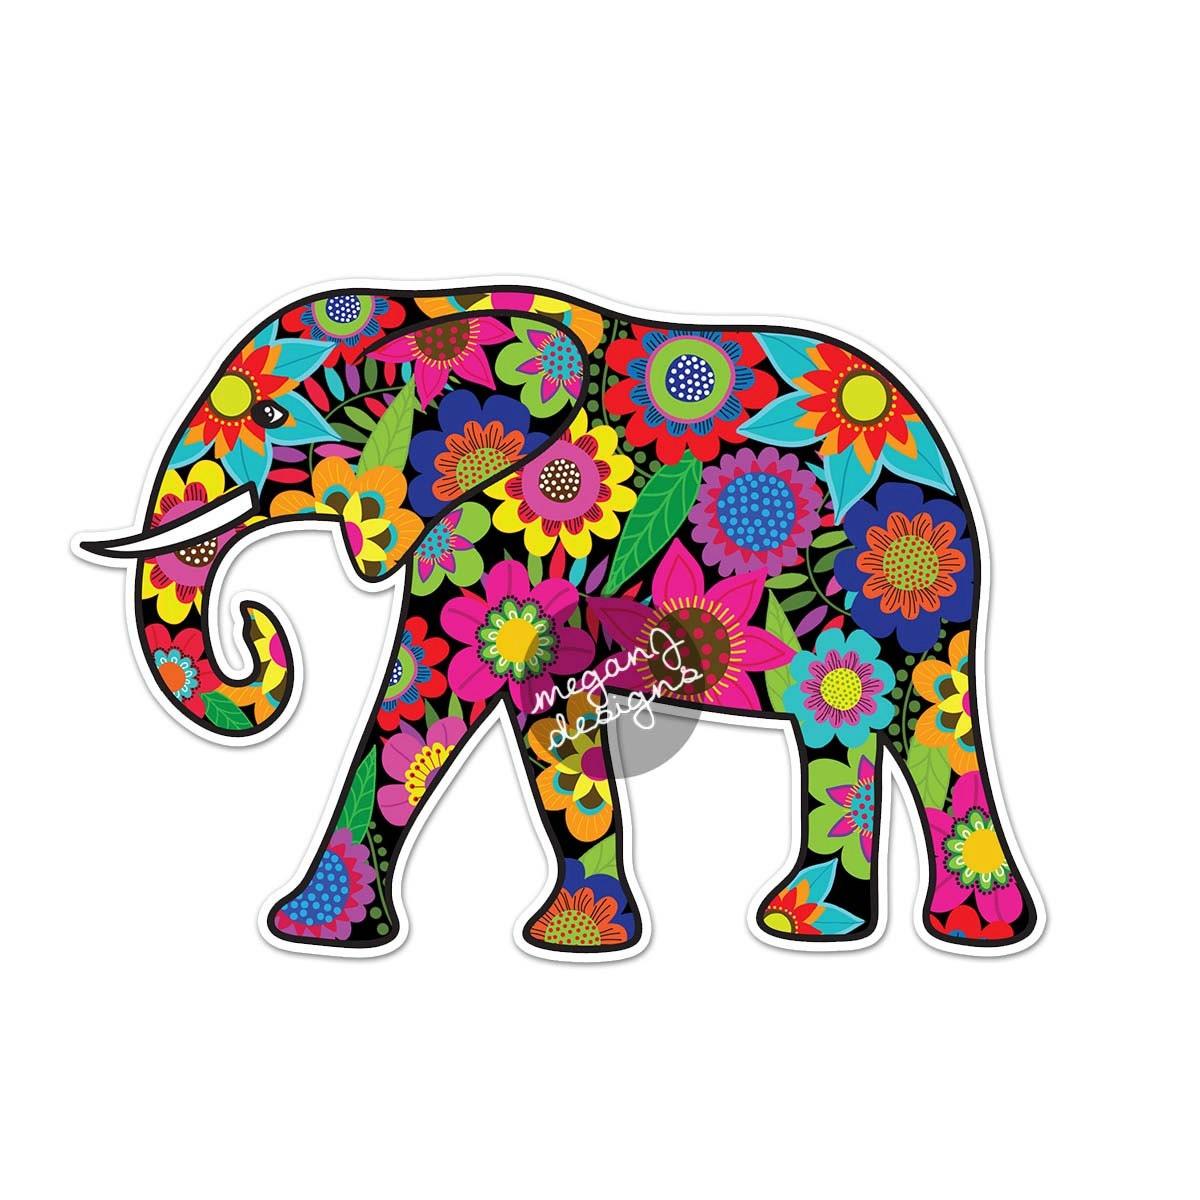 Elefant Auto Aufkleber Blumen bunte Aufkleber Laptop Aufkleber   Etsy